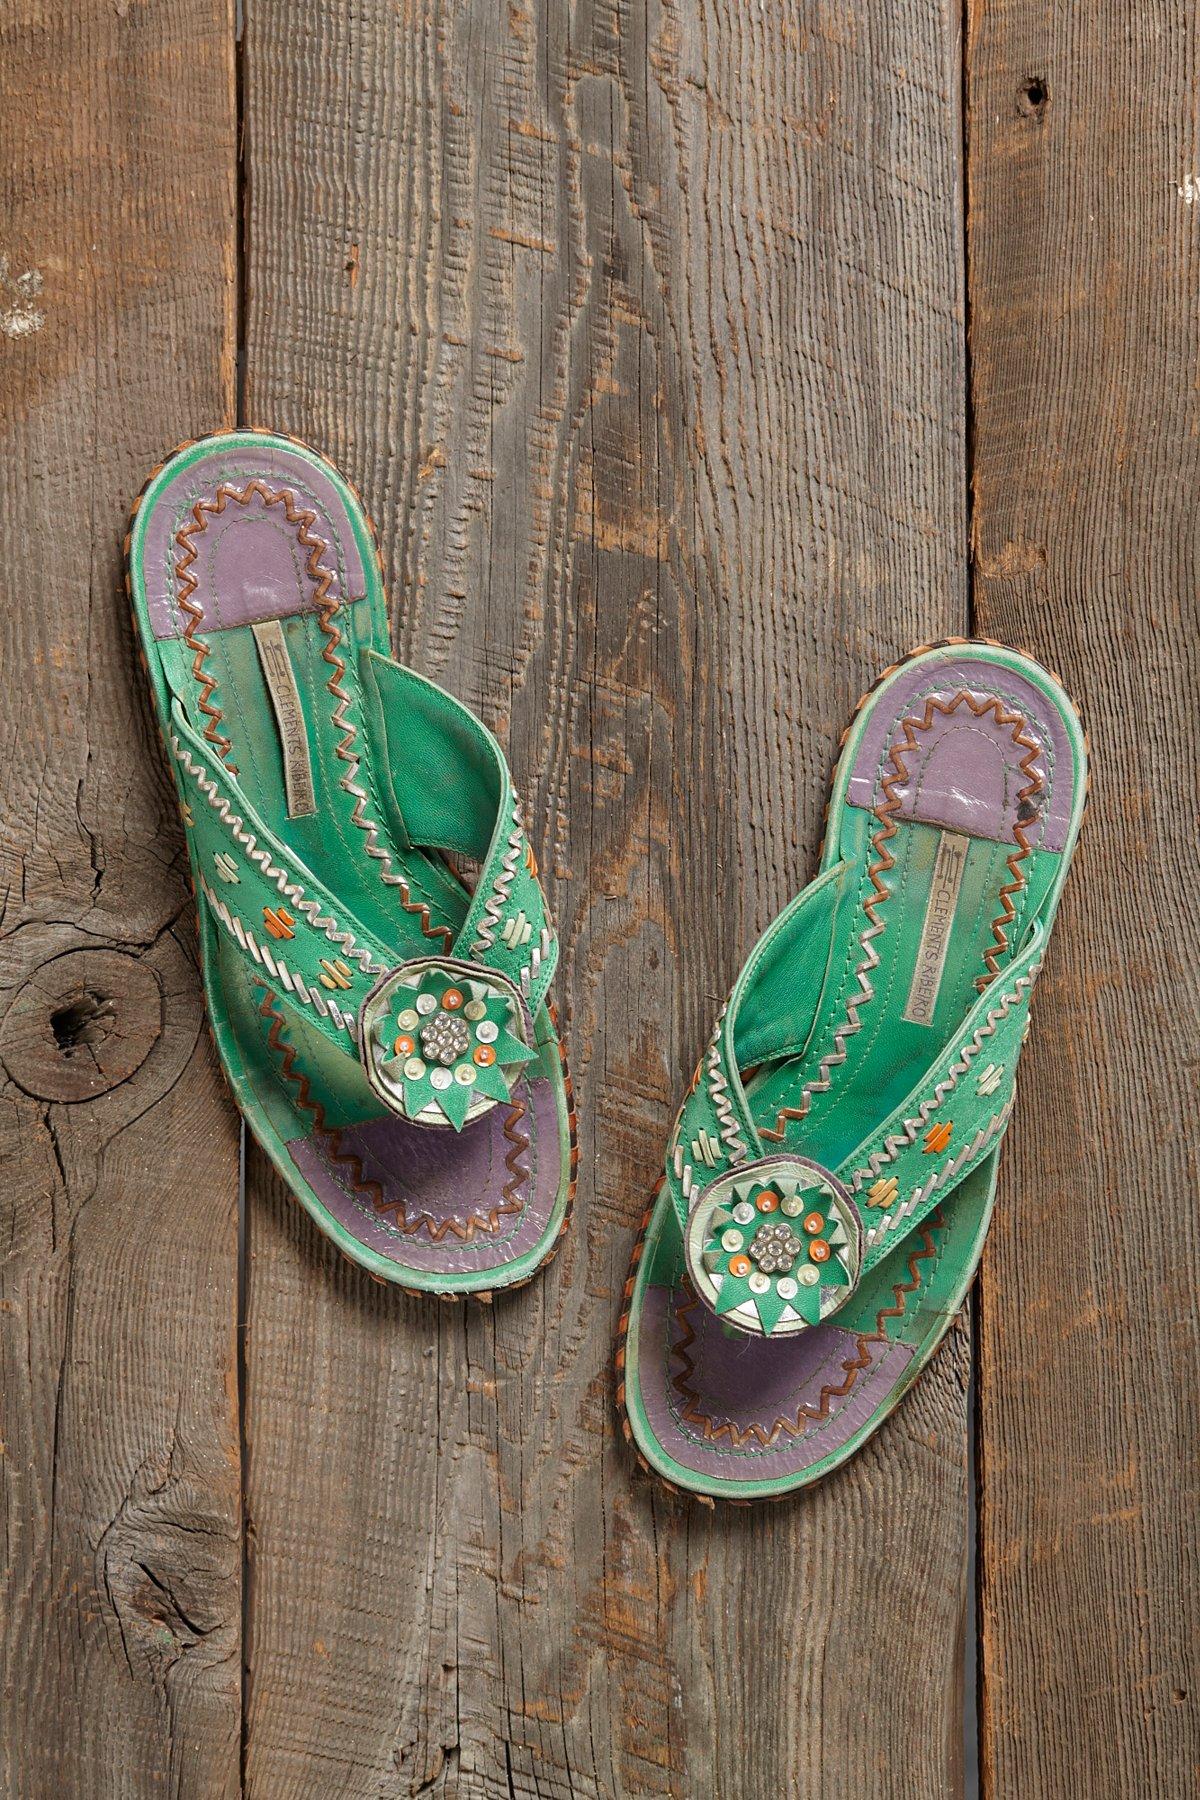 Vintage Stiched Sandals